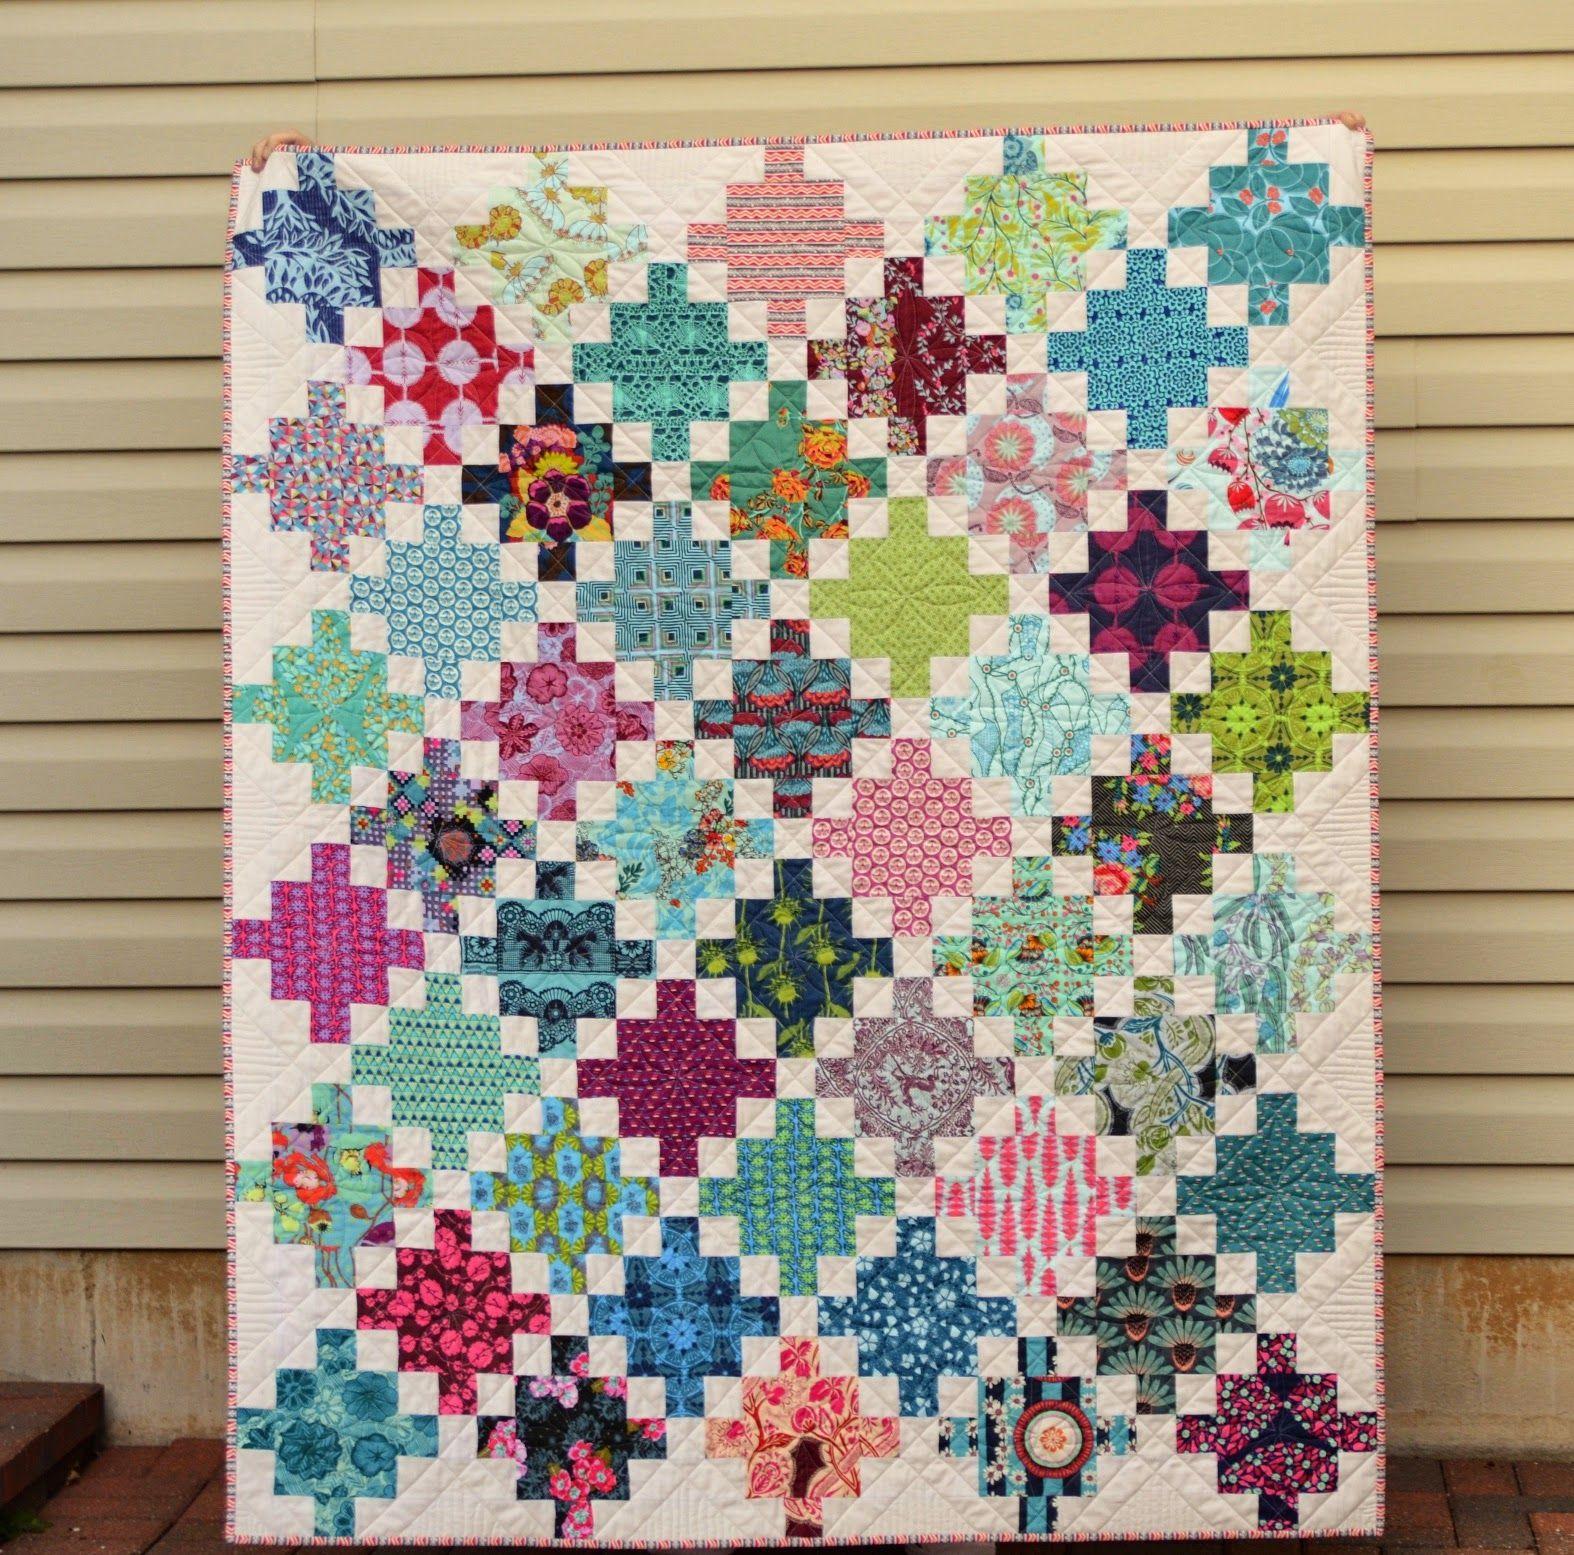 Hyacinth quilt designs cut